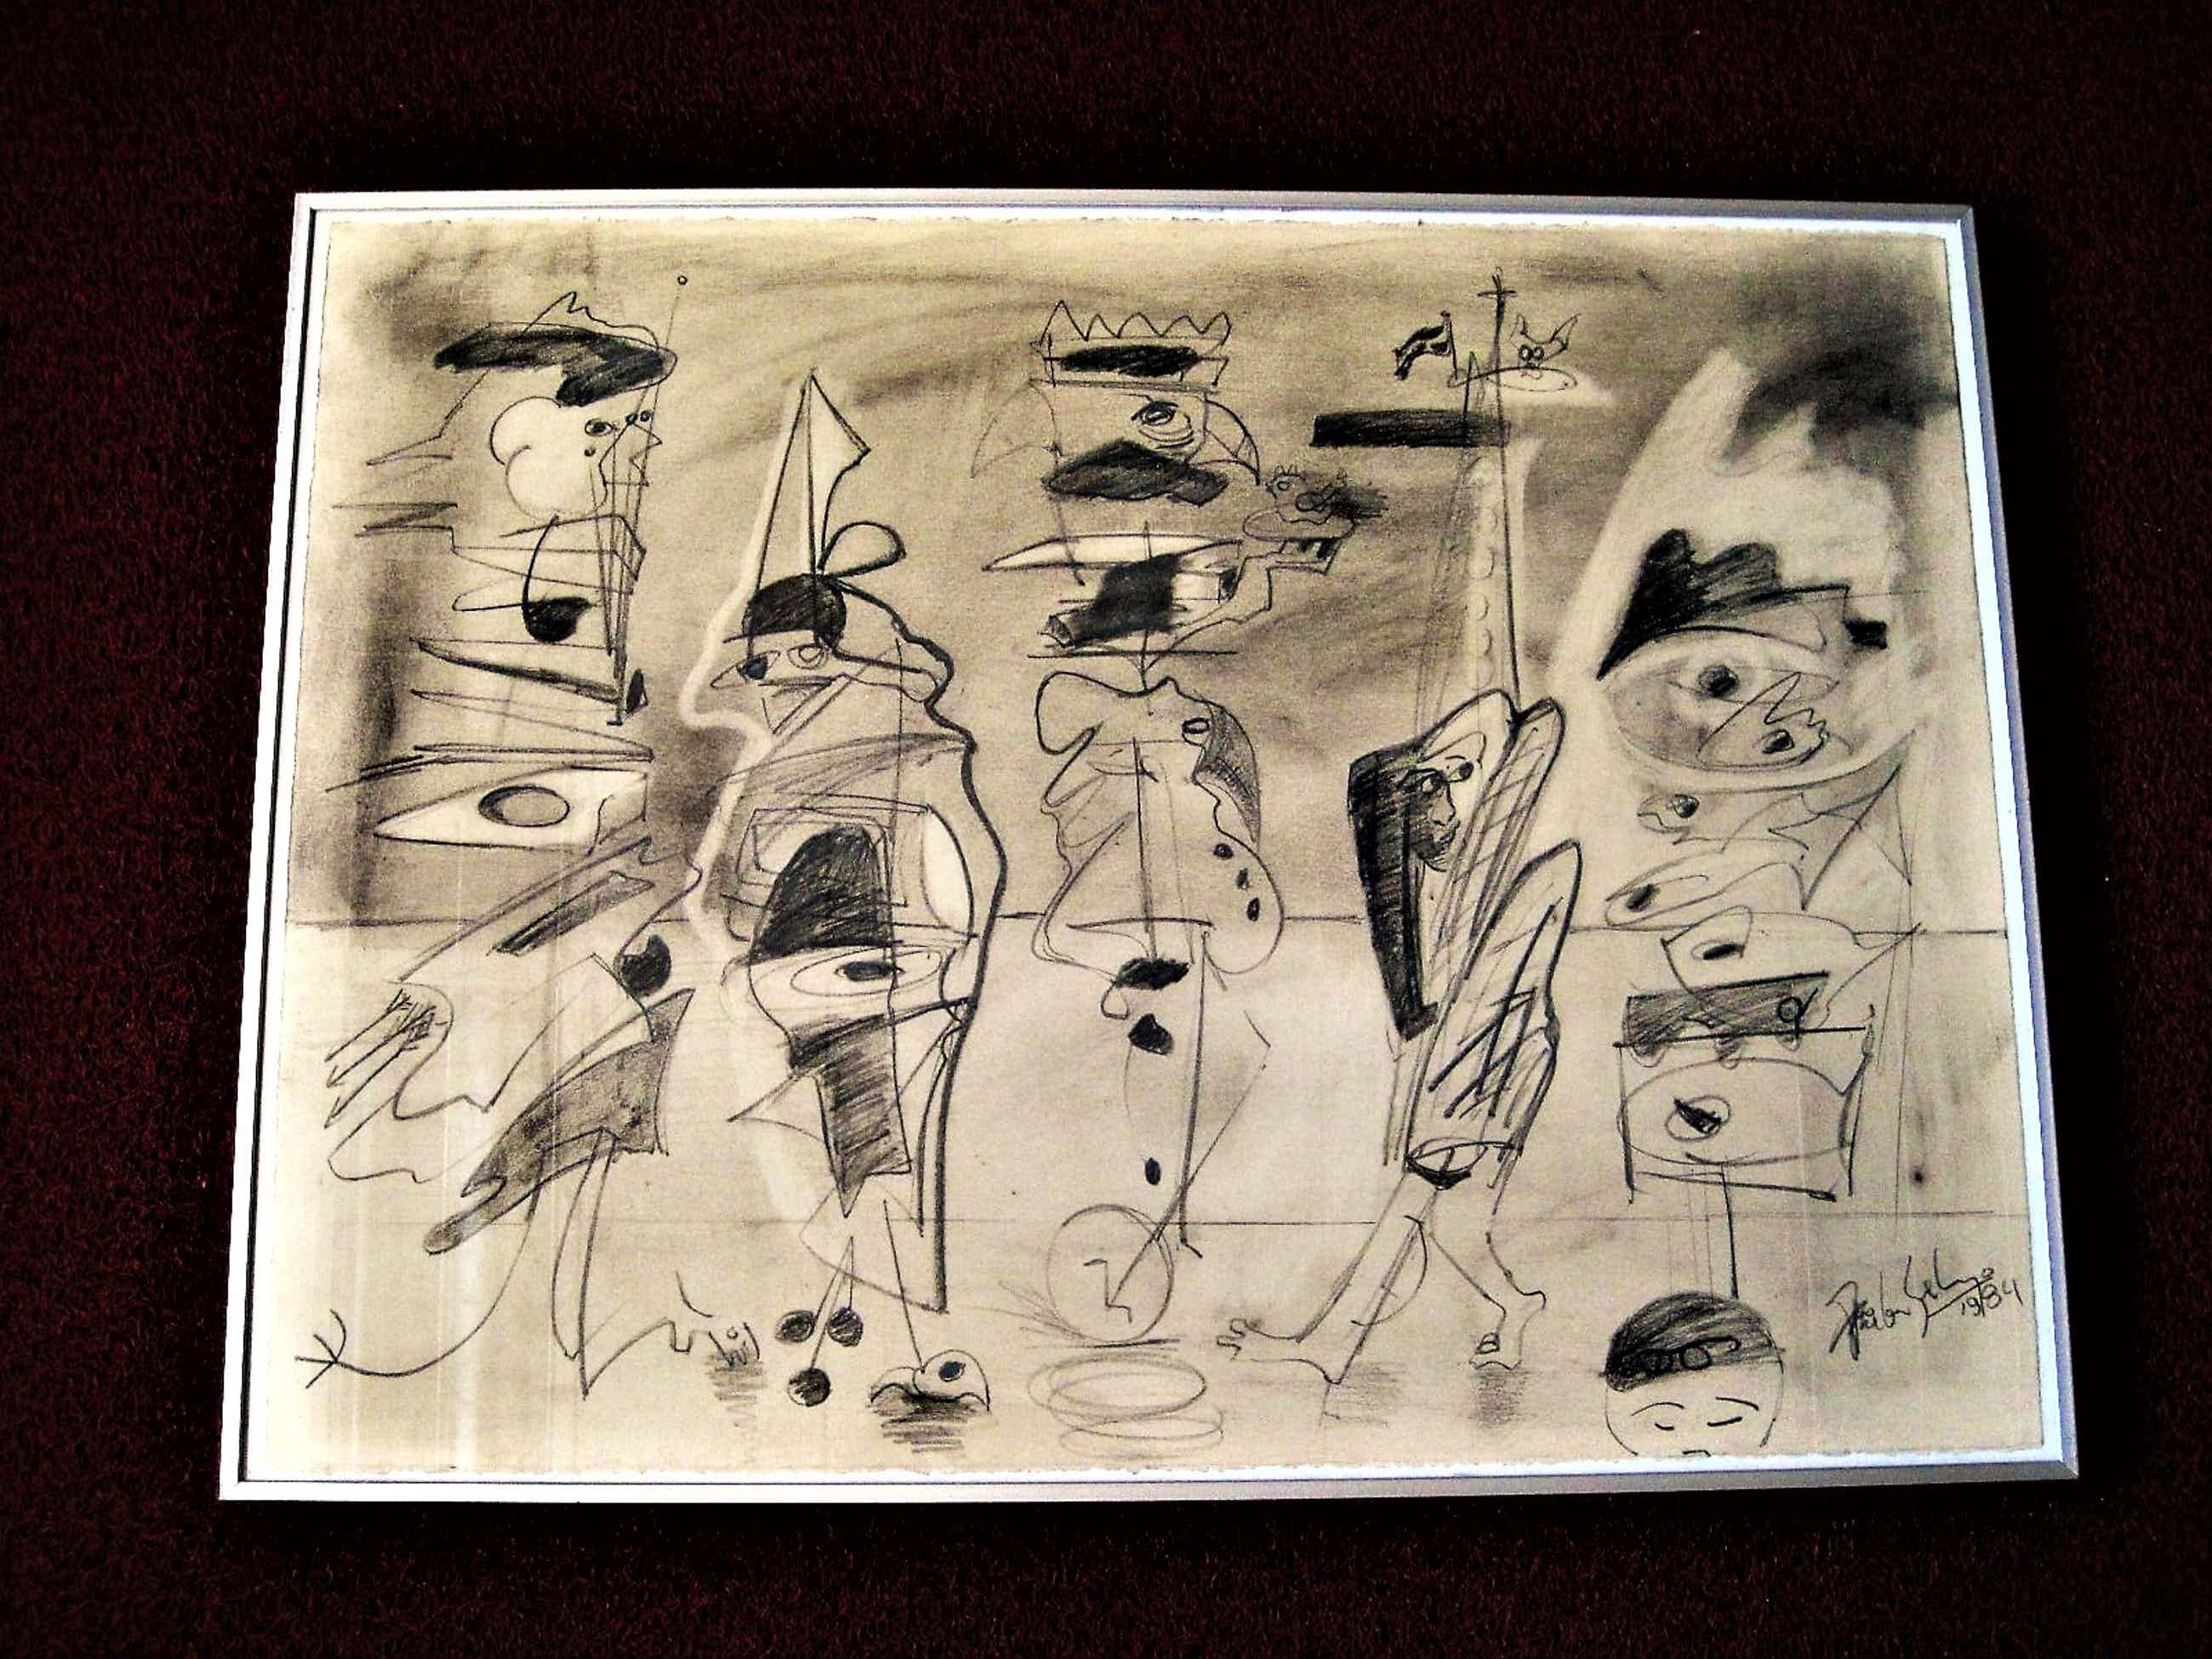 Arie van Selm - 1985 Galerie d'Eendt Amsterdam - Grote Abstract Figuratieve Tekening - gesigd. kopen? Bied vanaf 50!